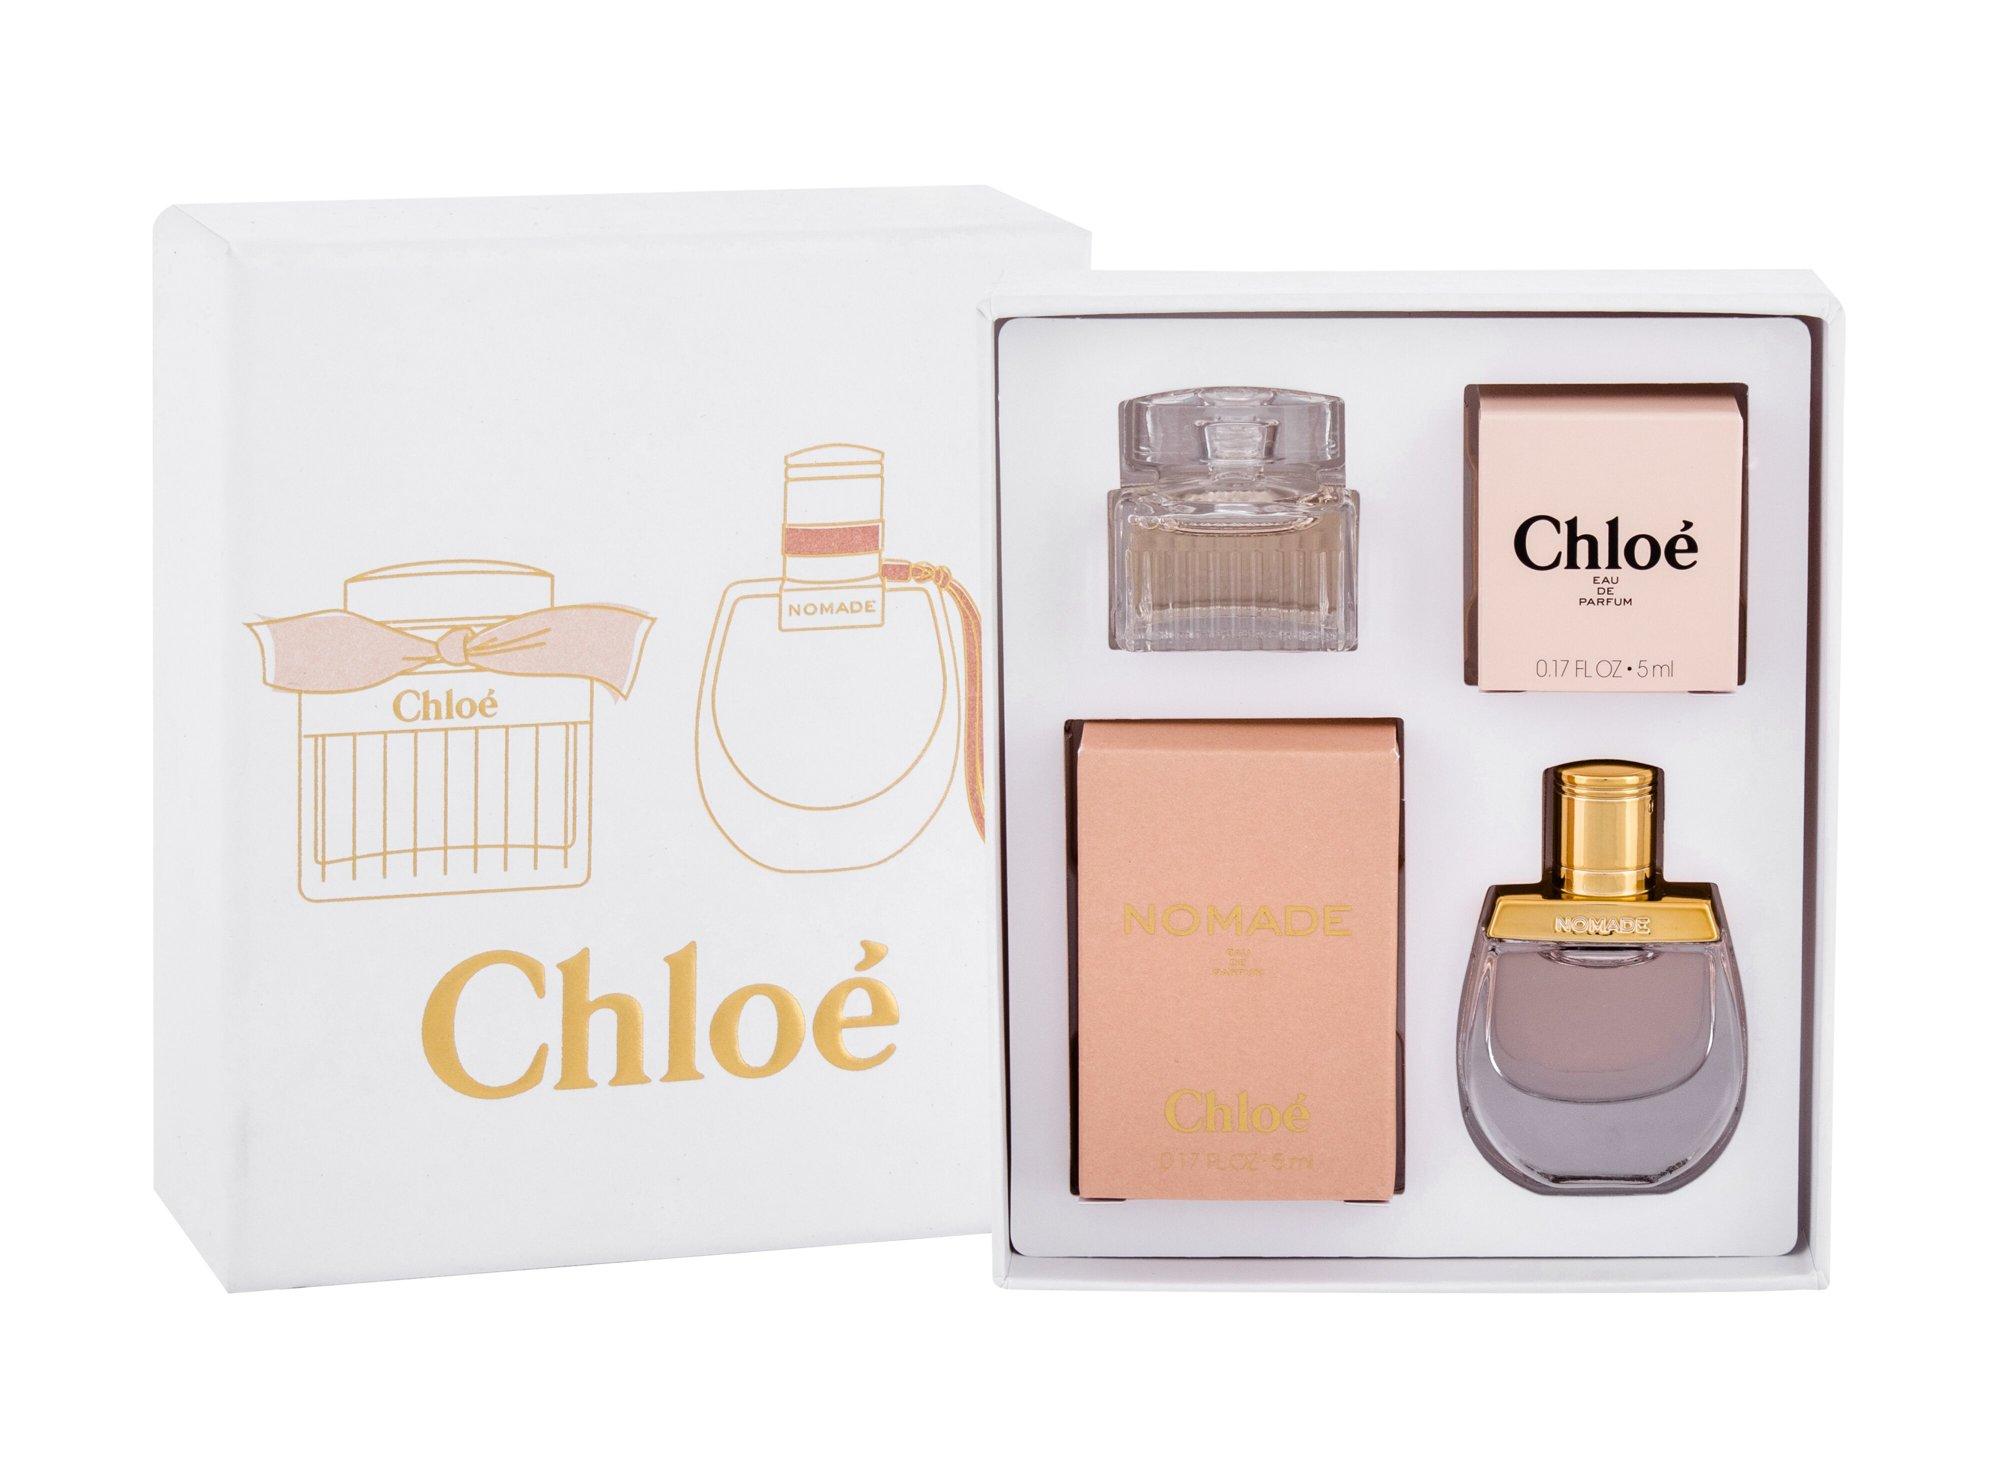 Chloé Mini Set Chloé & Nomade, parfumovaná voda Chloe 5 ml + parfumovaná voda Nomade 5 ml